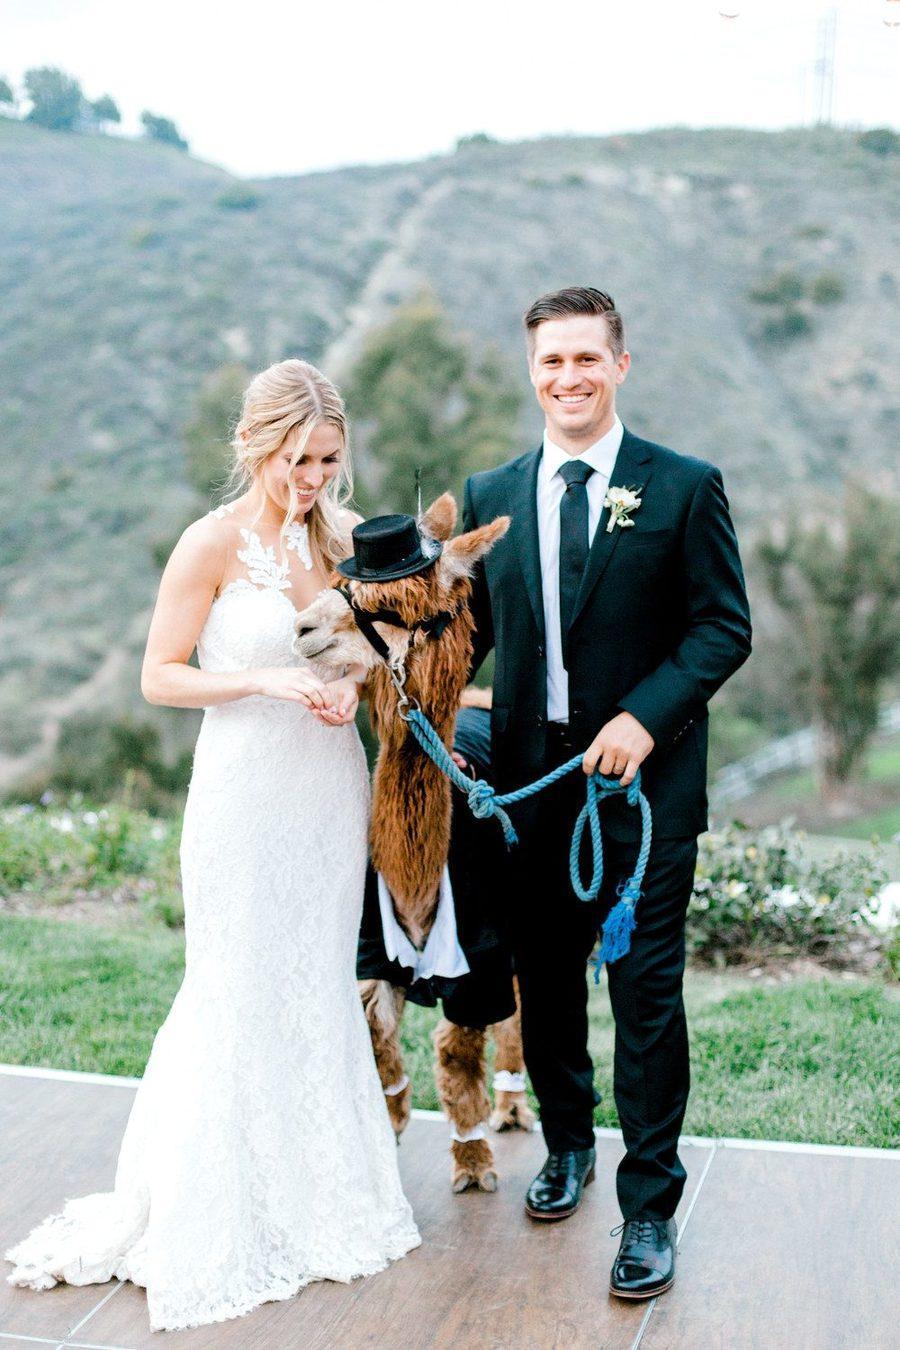 Lovable Backyard Wedding Alpacas 01